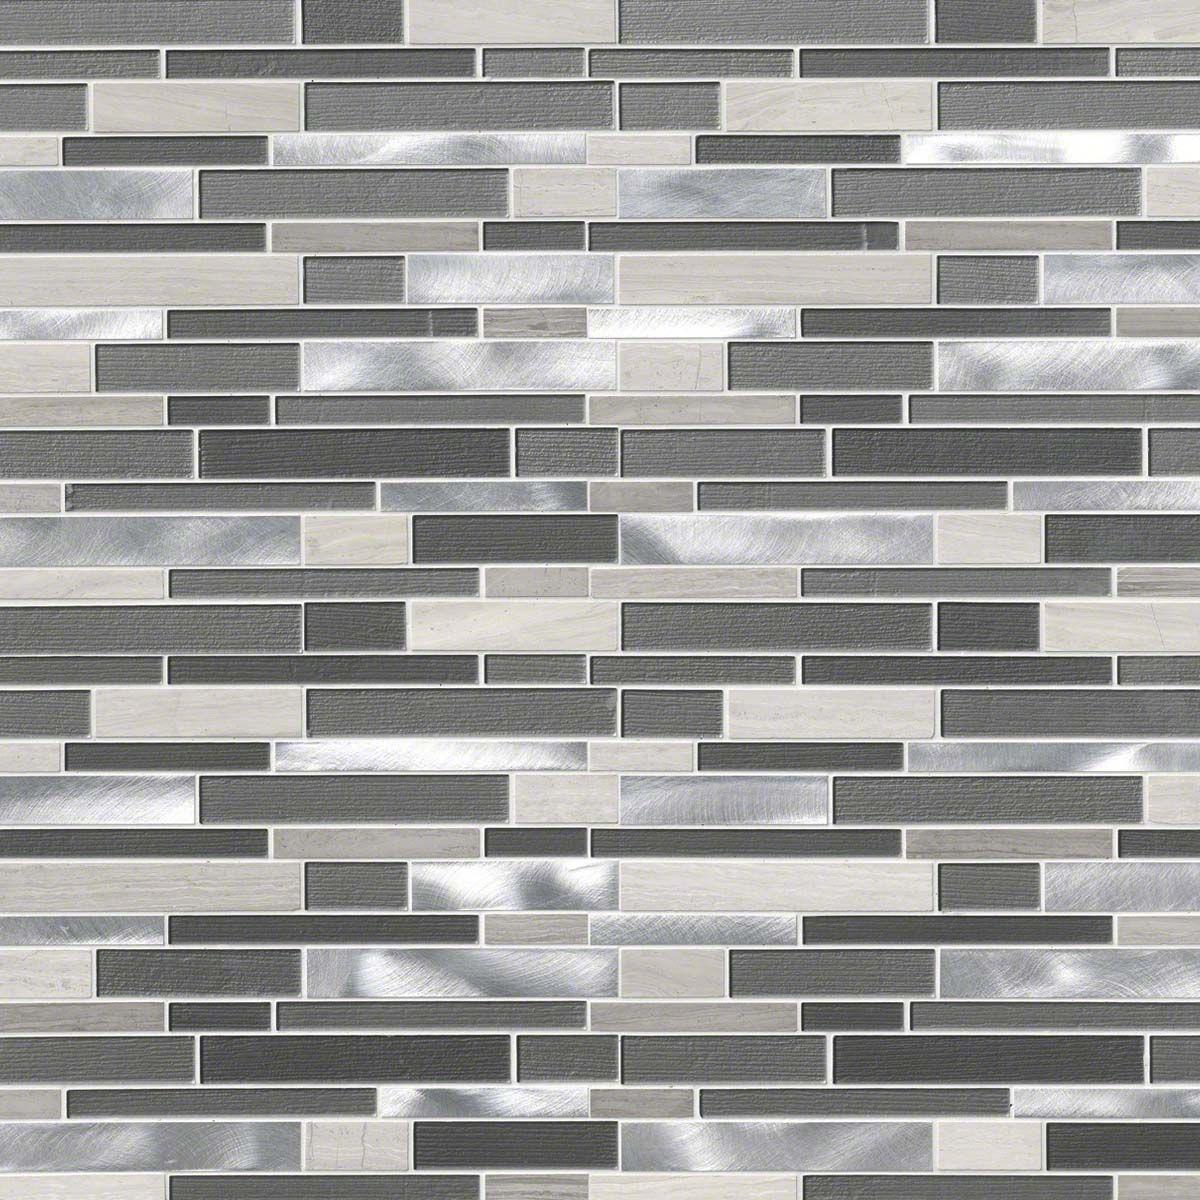 Urban Loft Interlocking Pattern 4mm - Mosaics